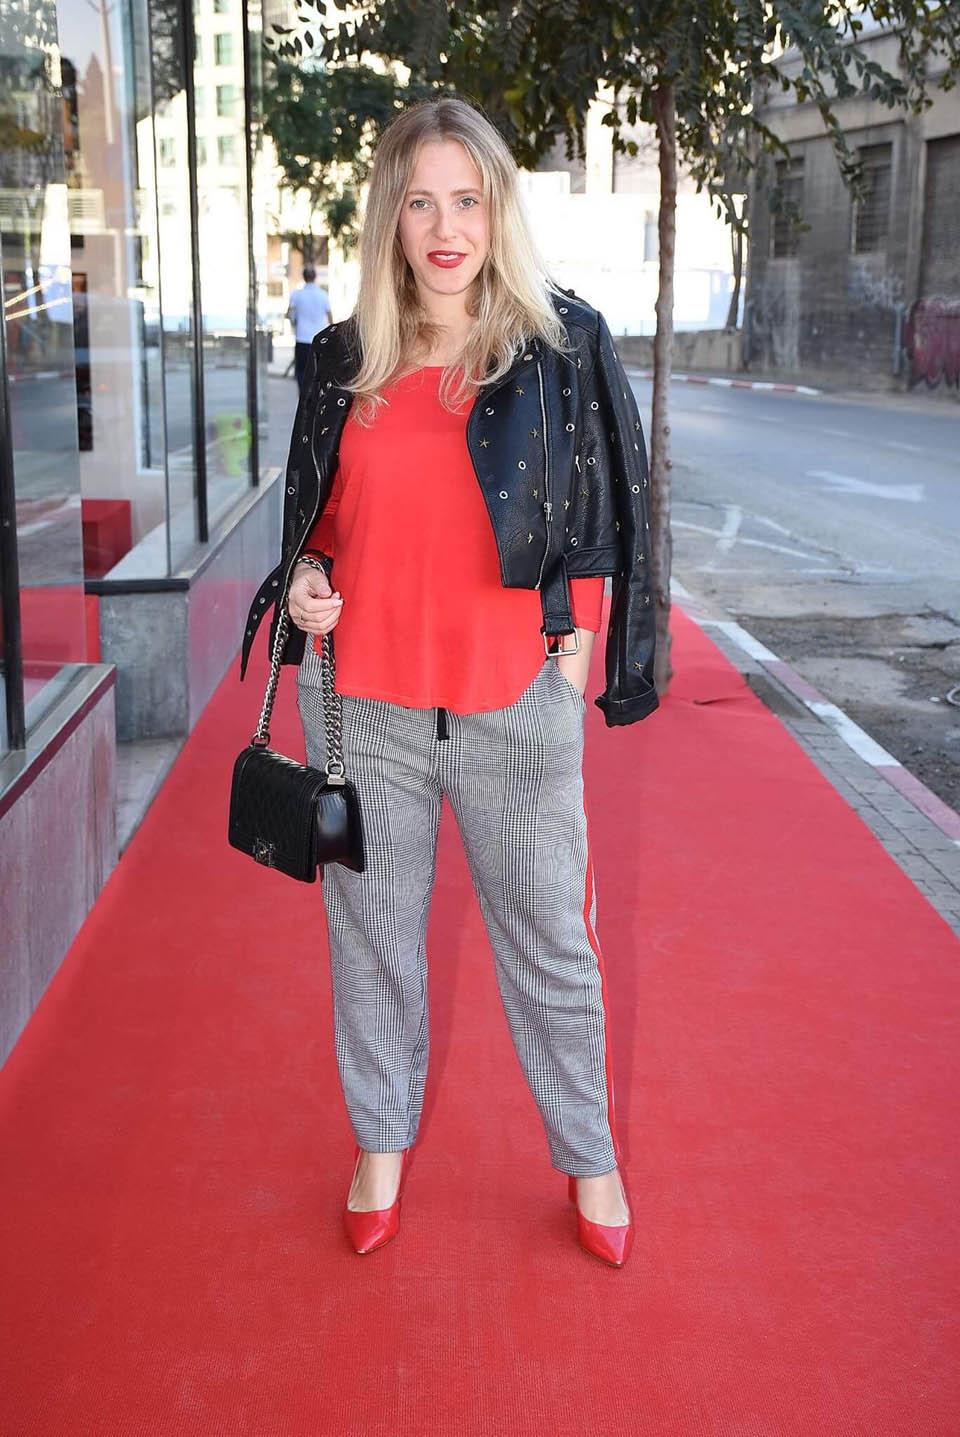 Михаль Портман на 4-м месяце. Брюки и жакет Zara, рубашка Хенс, туфли To Go. Фото: Авив Хофи.